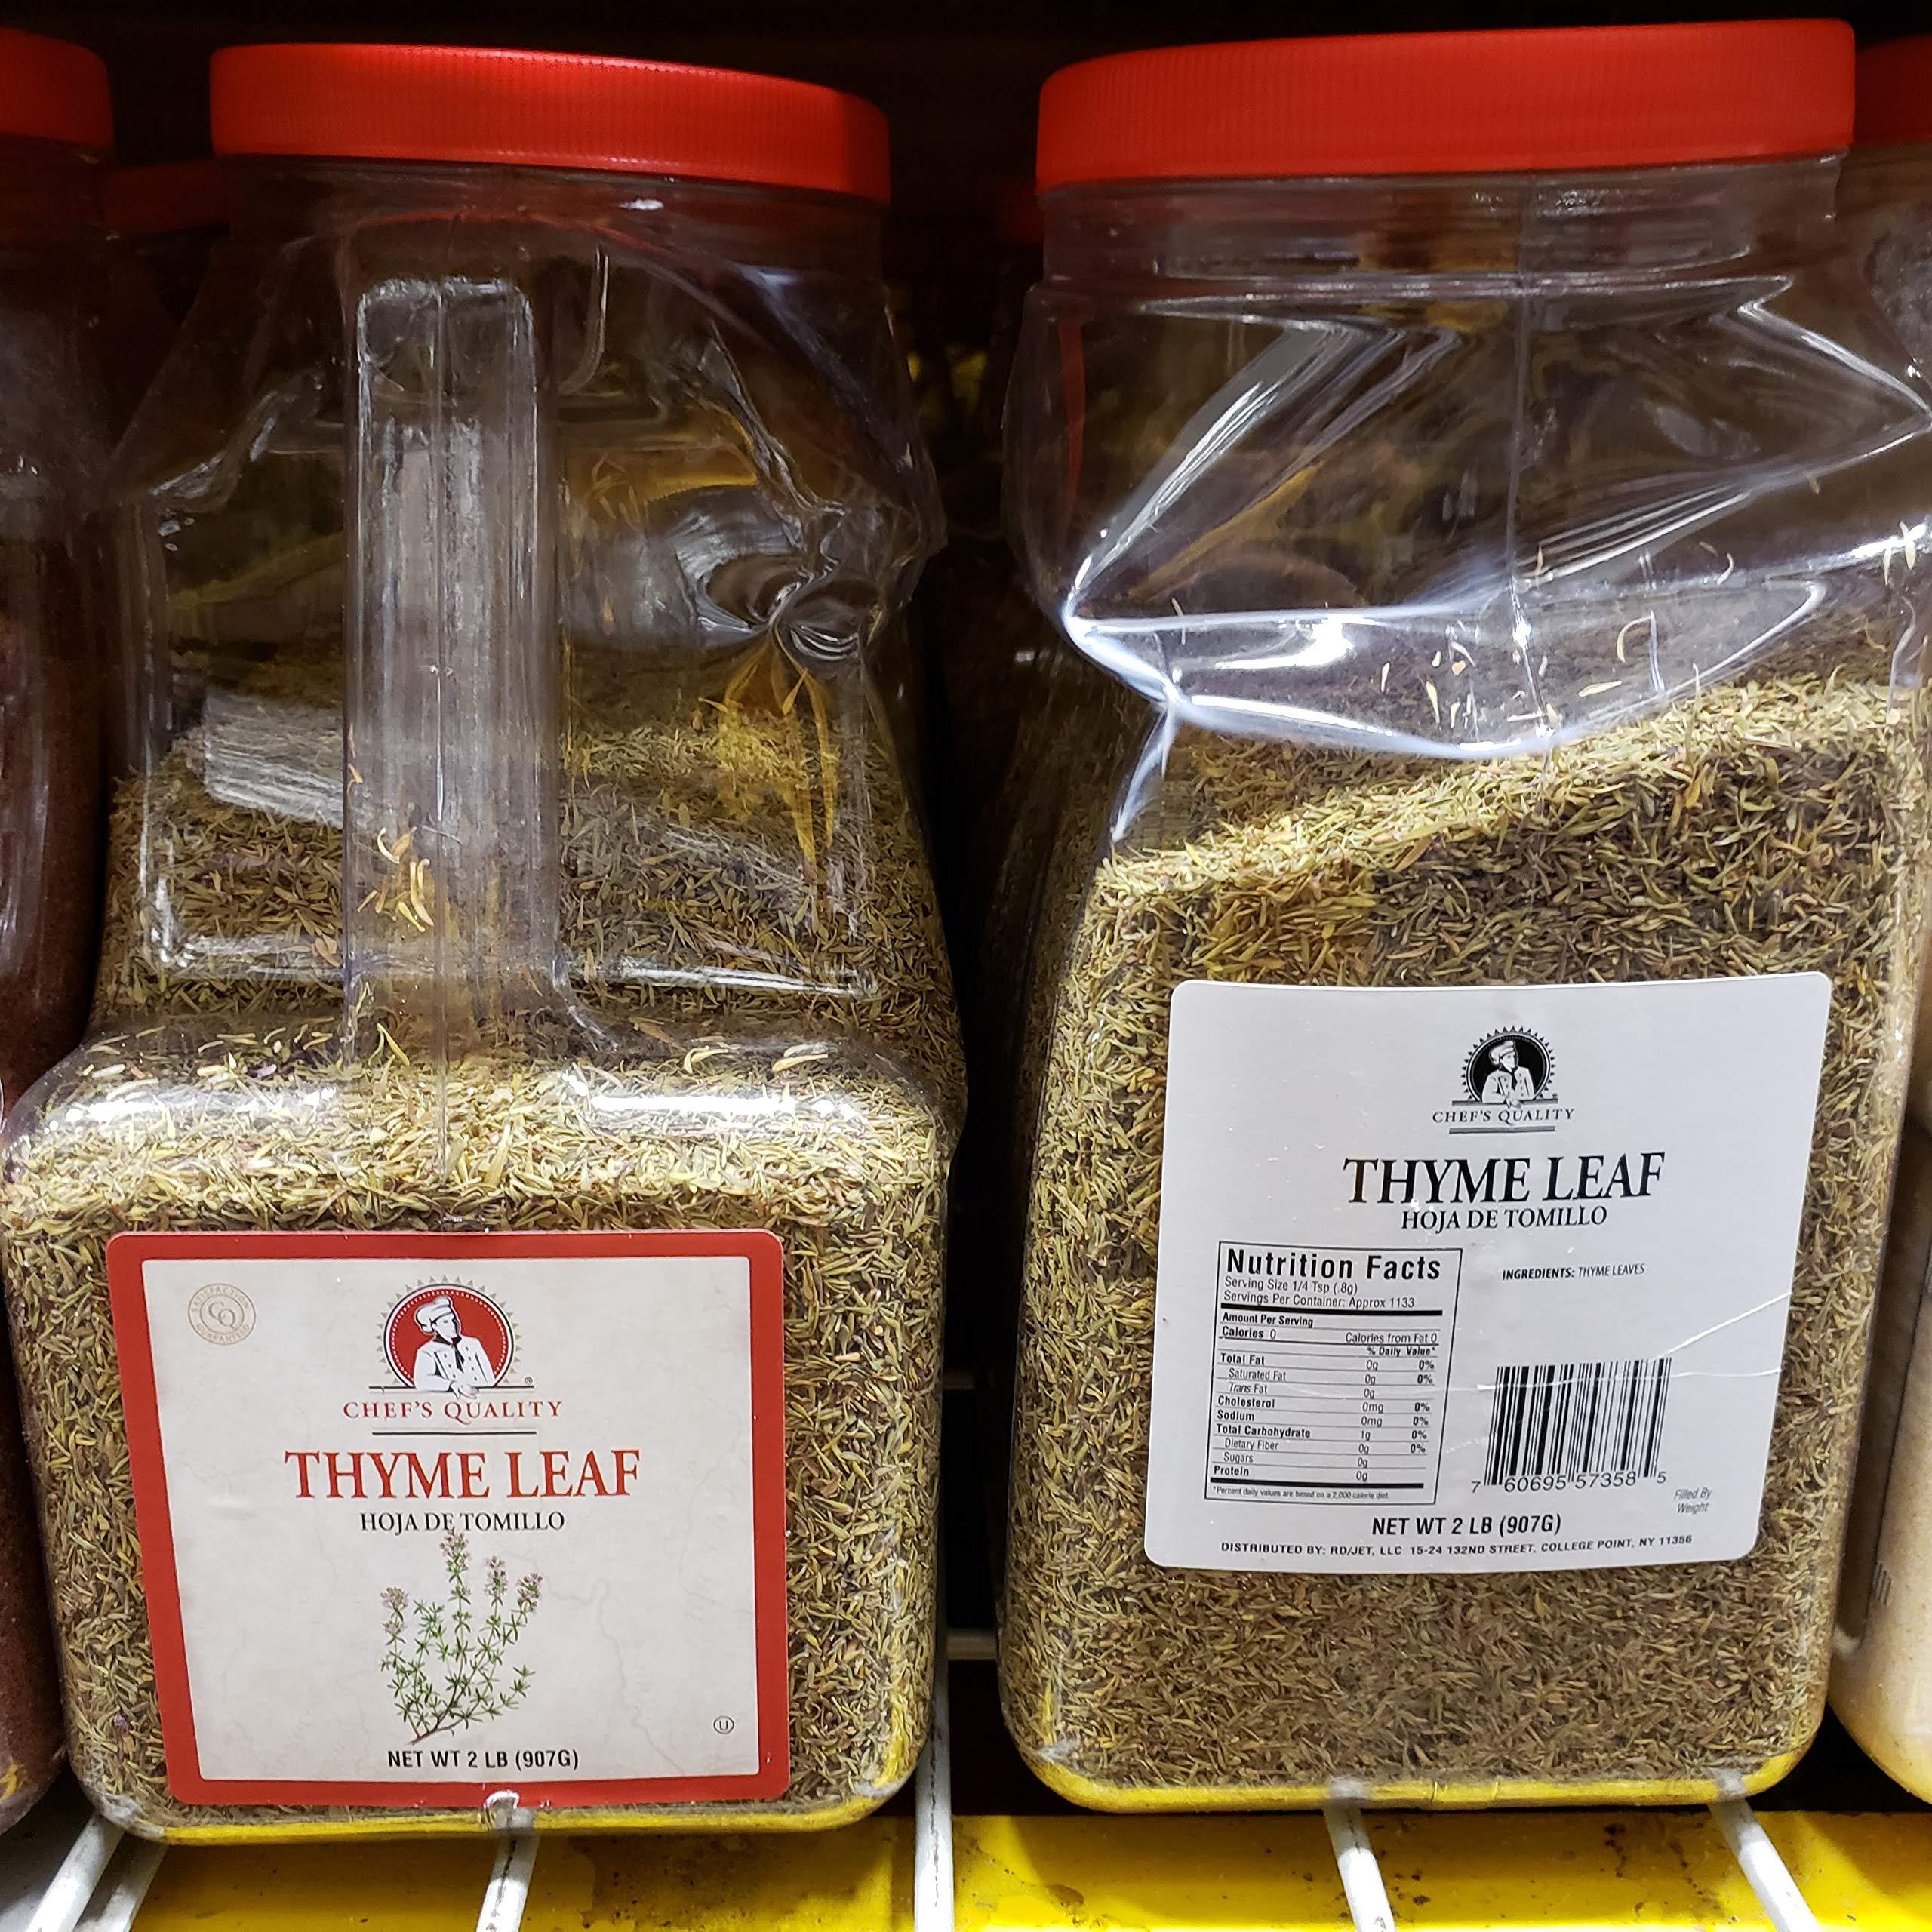 Chef's Quality Thyme Leaf 2 lbs